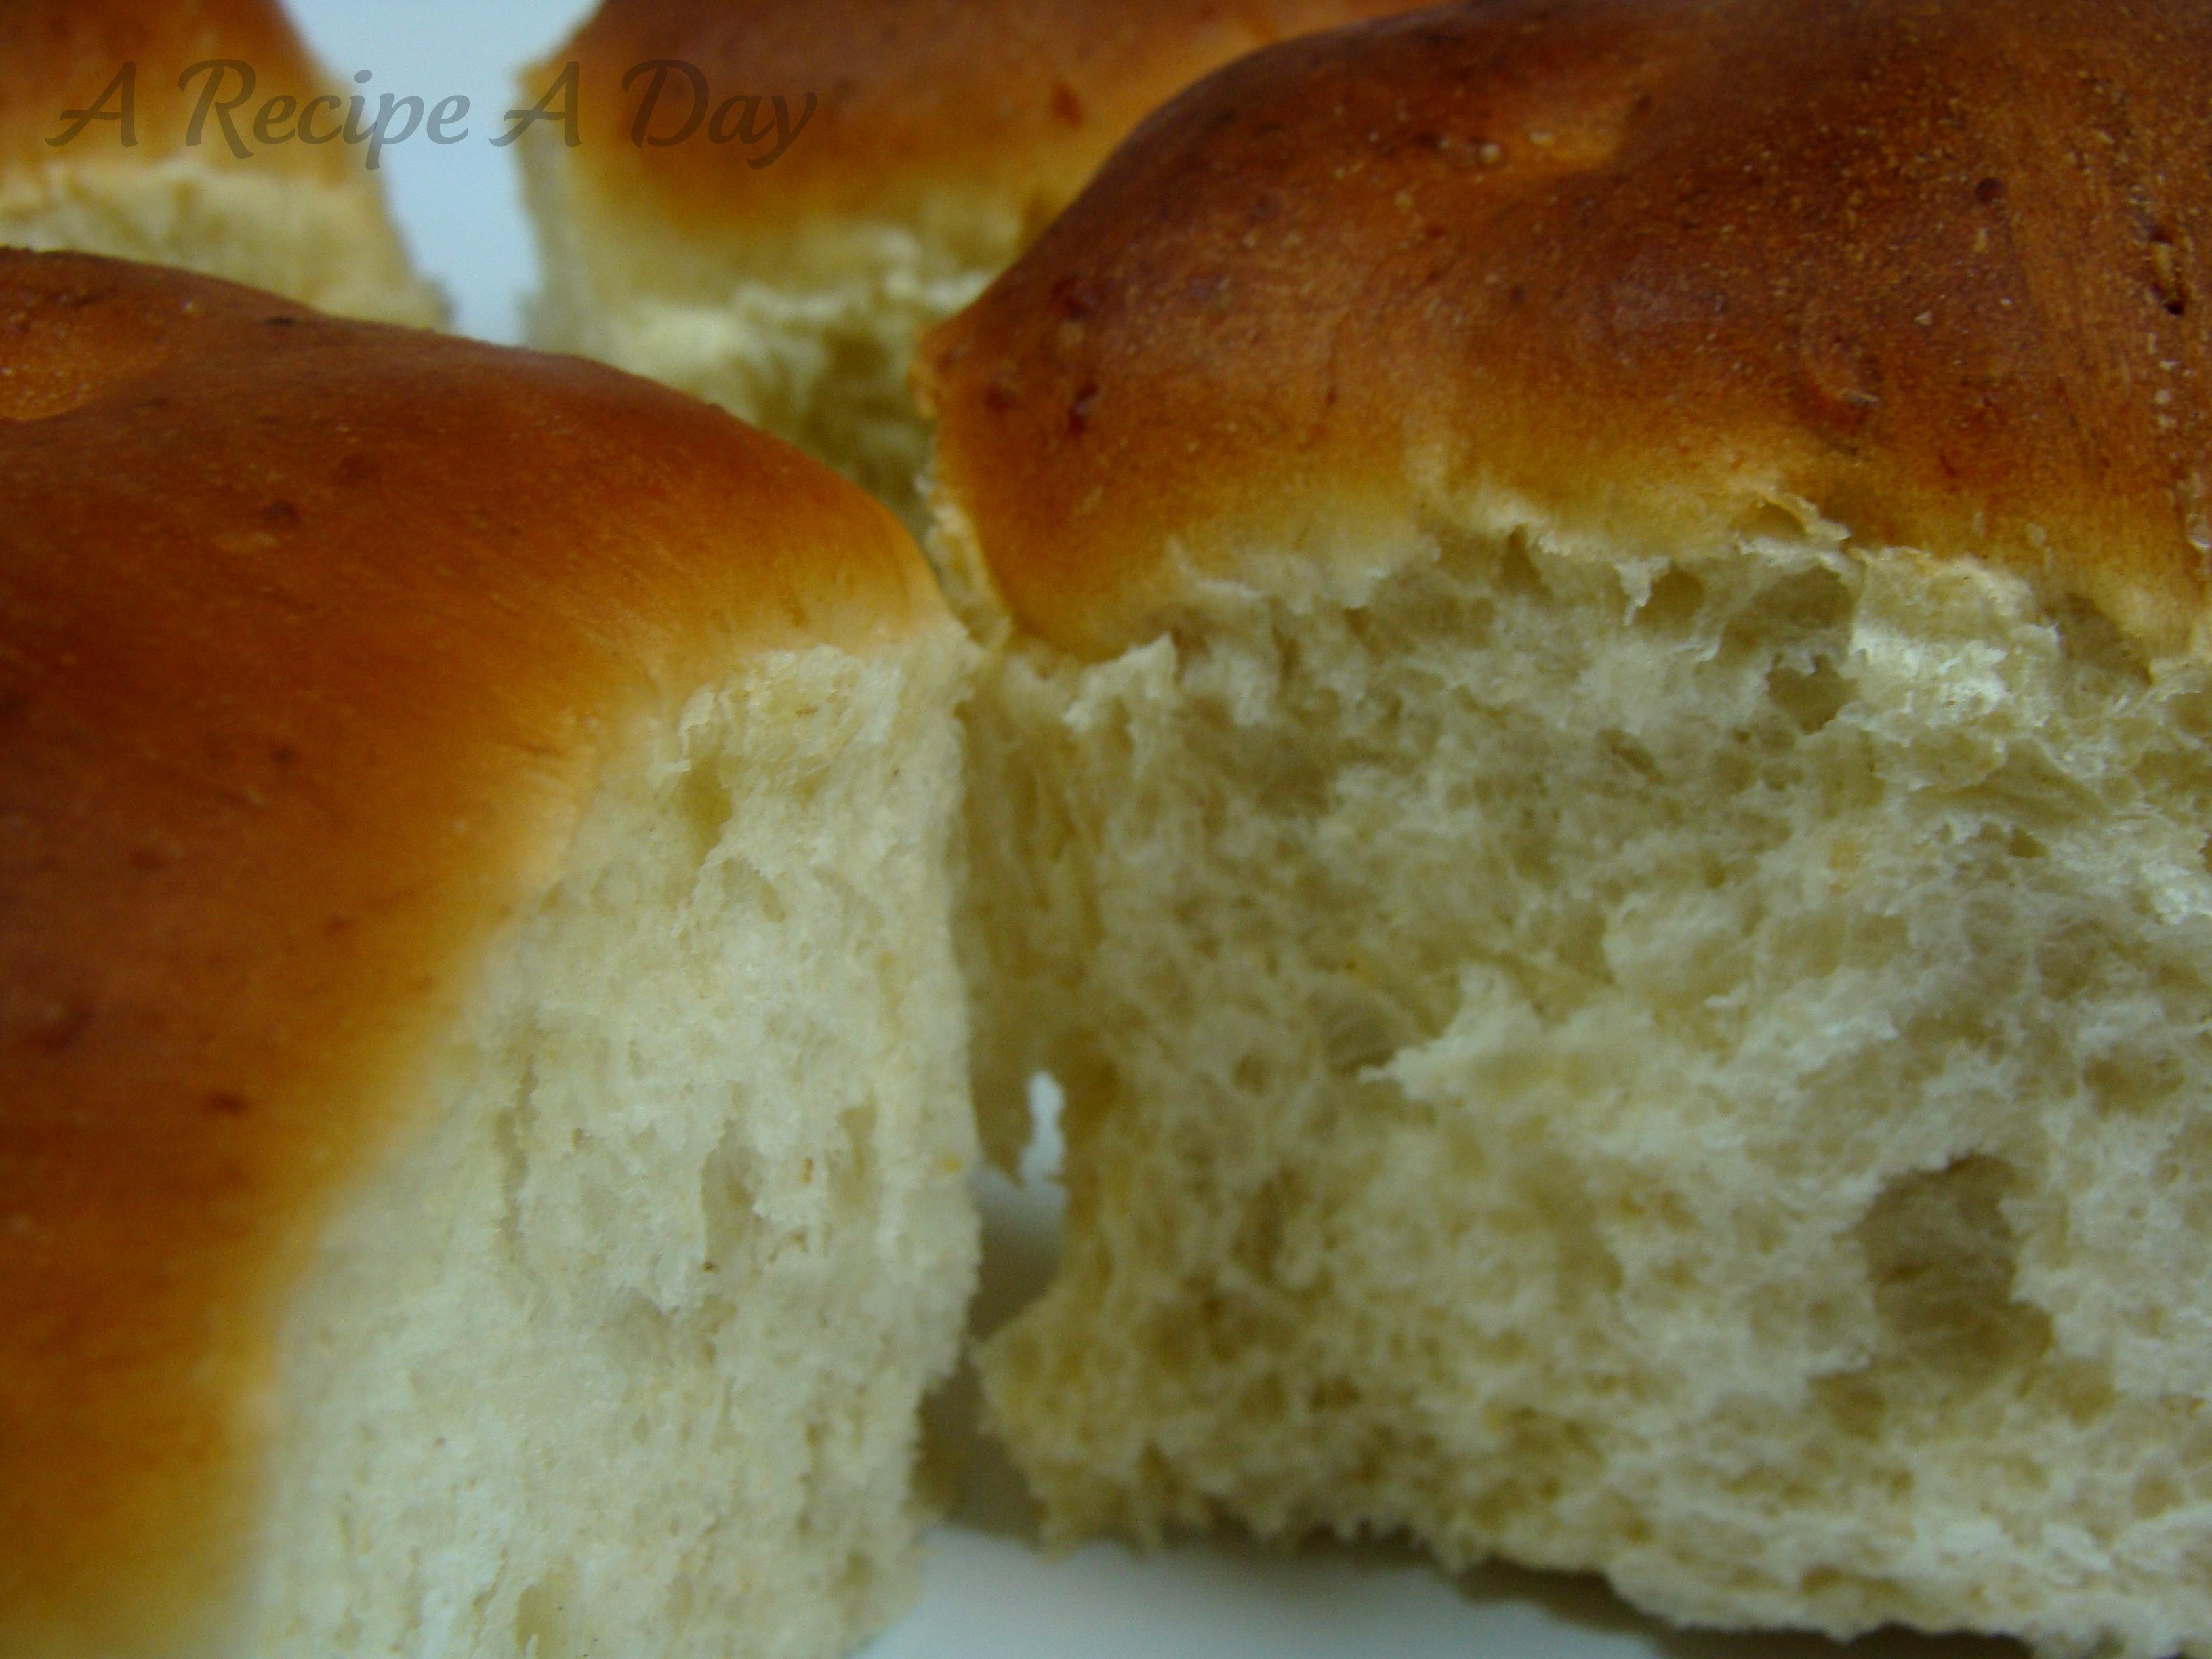 oatmeal-rolls-added